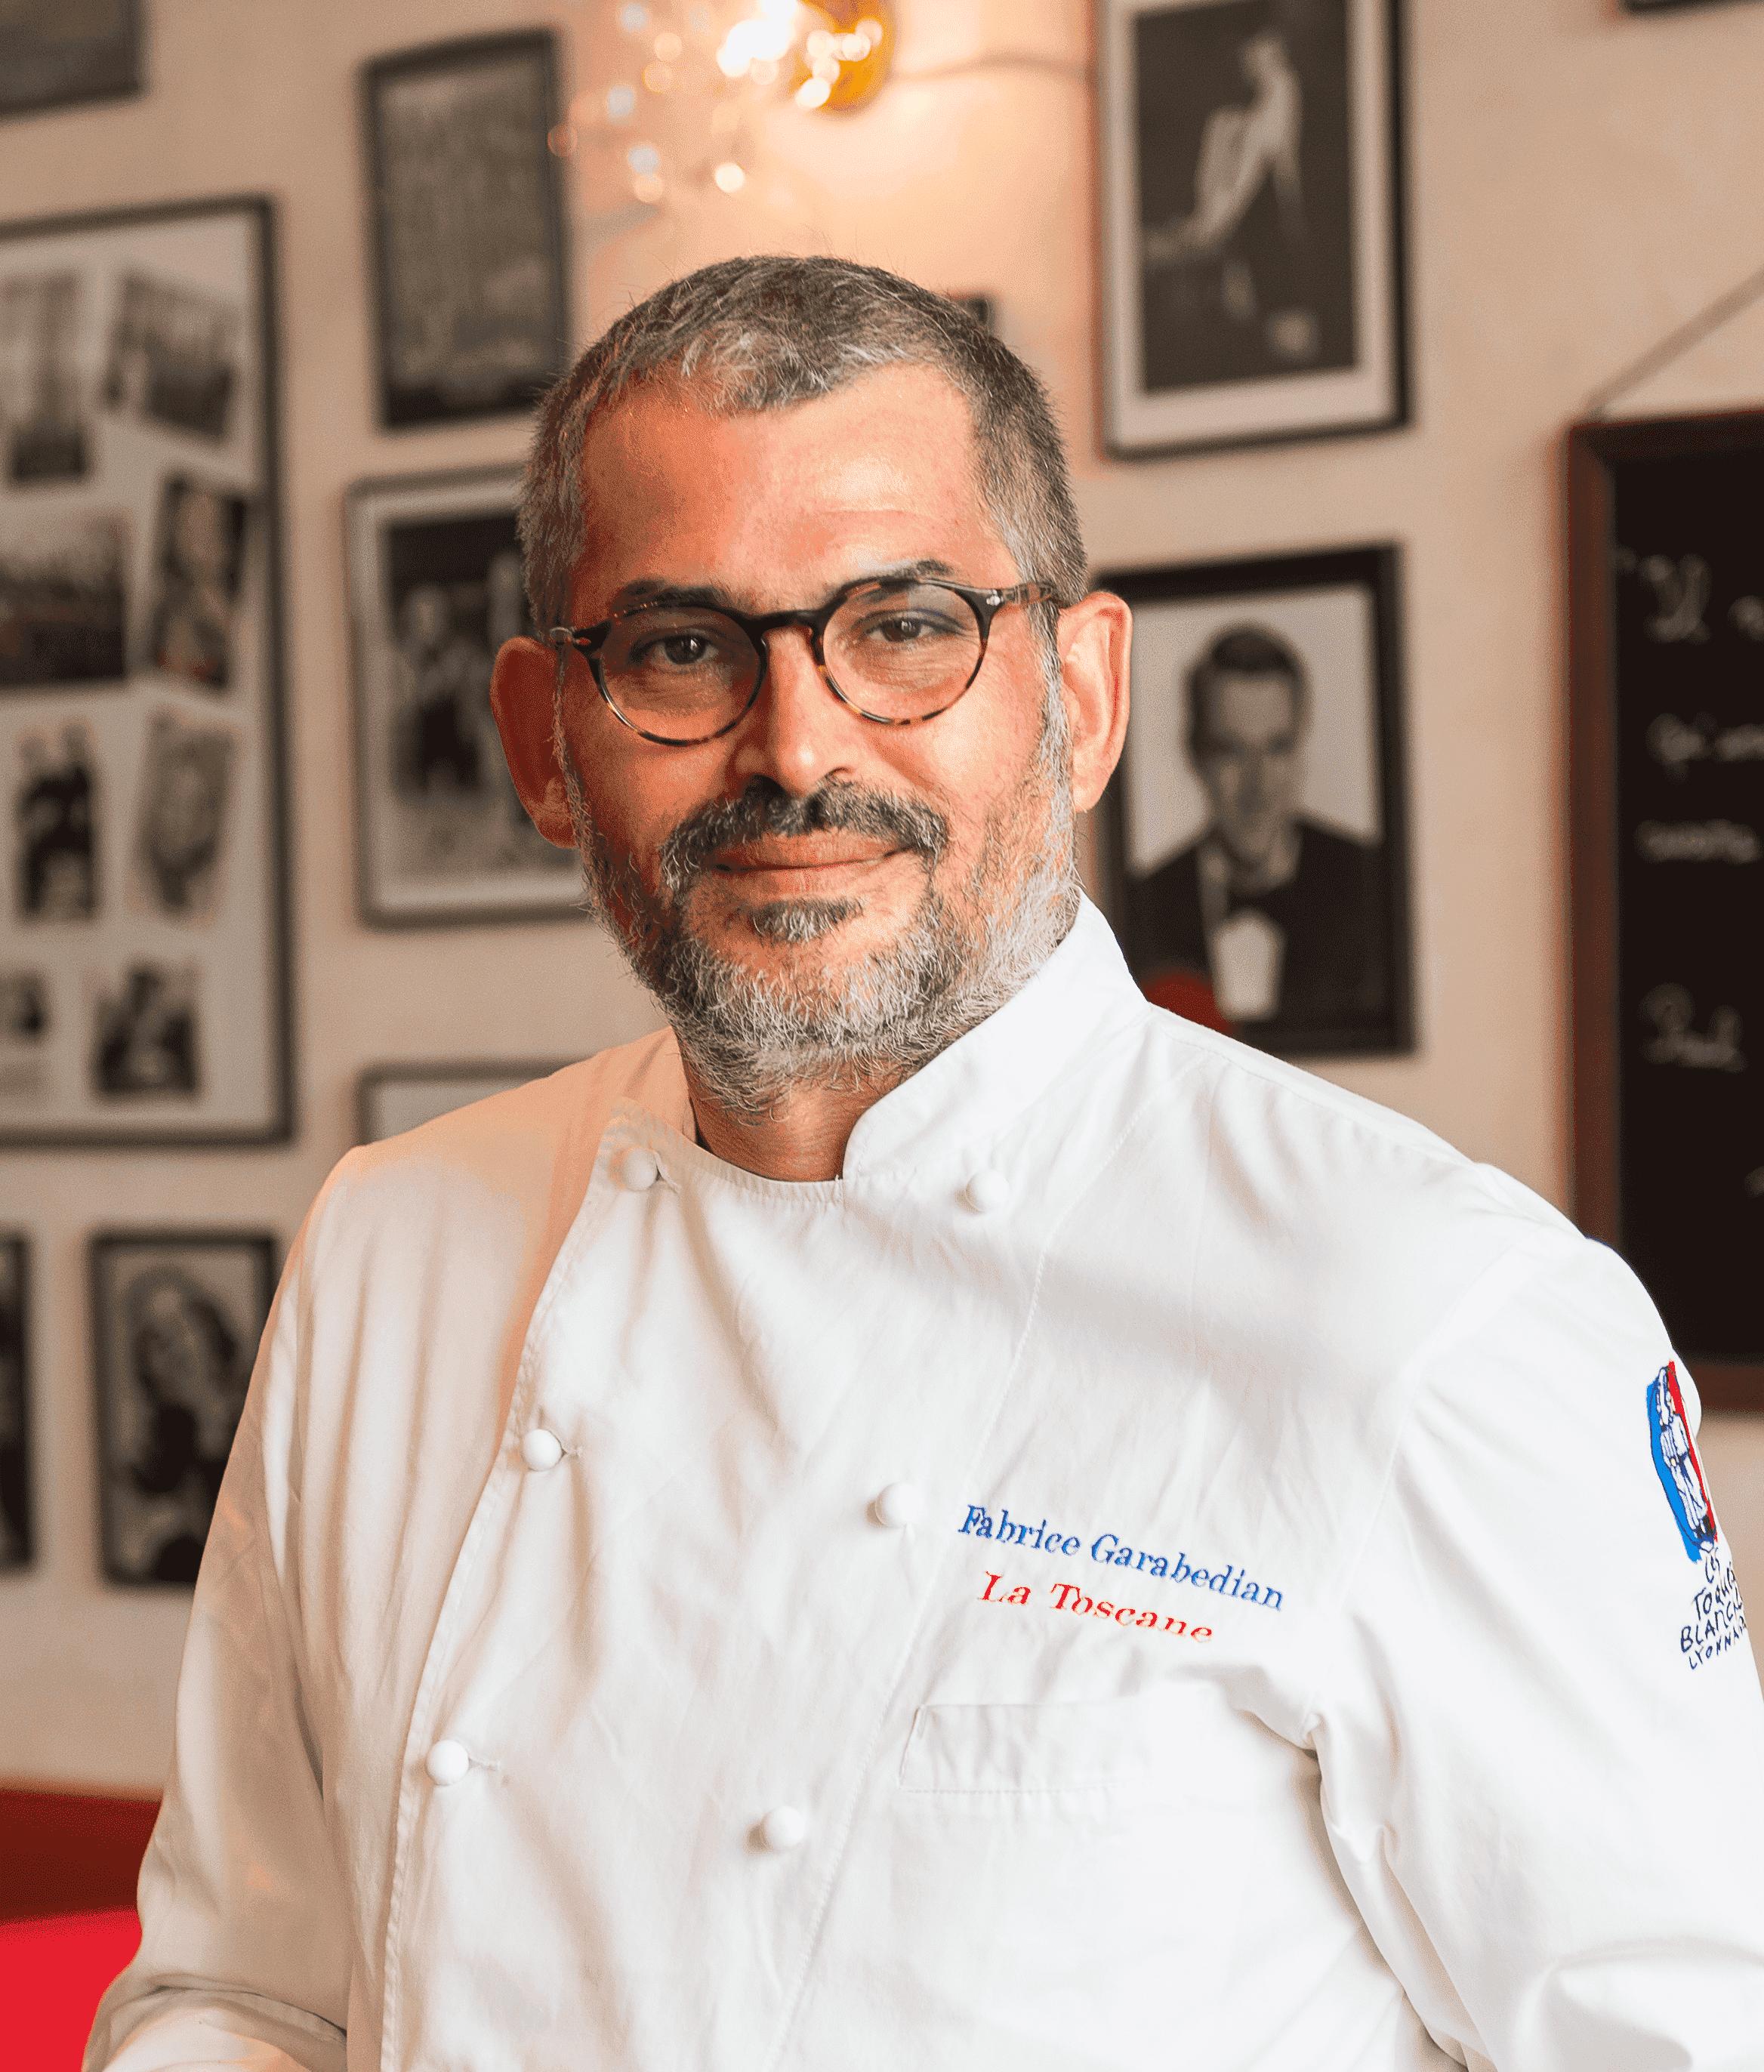 Restaurant La Toscane - Fabrice GARABEDIAN